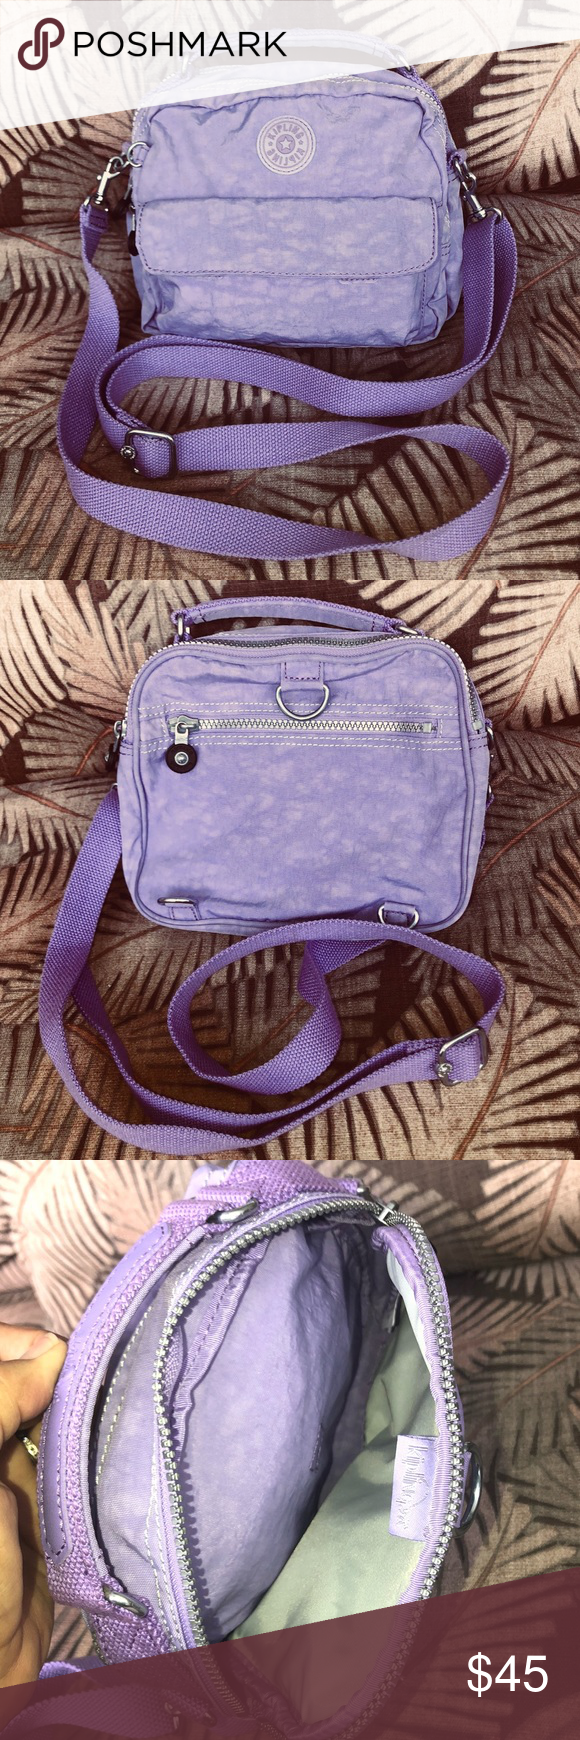 Kipling Candy Handbag Mini Backpack Euc Lavender My Posh Picks